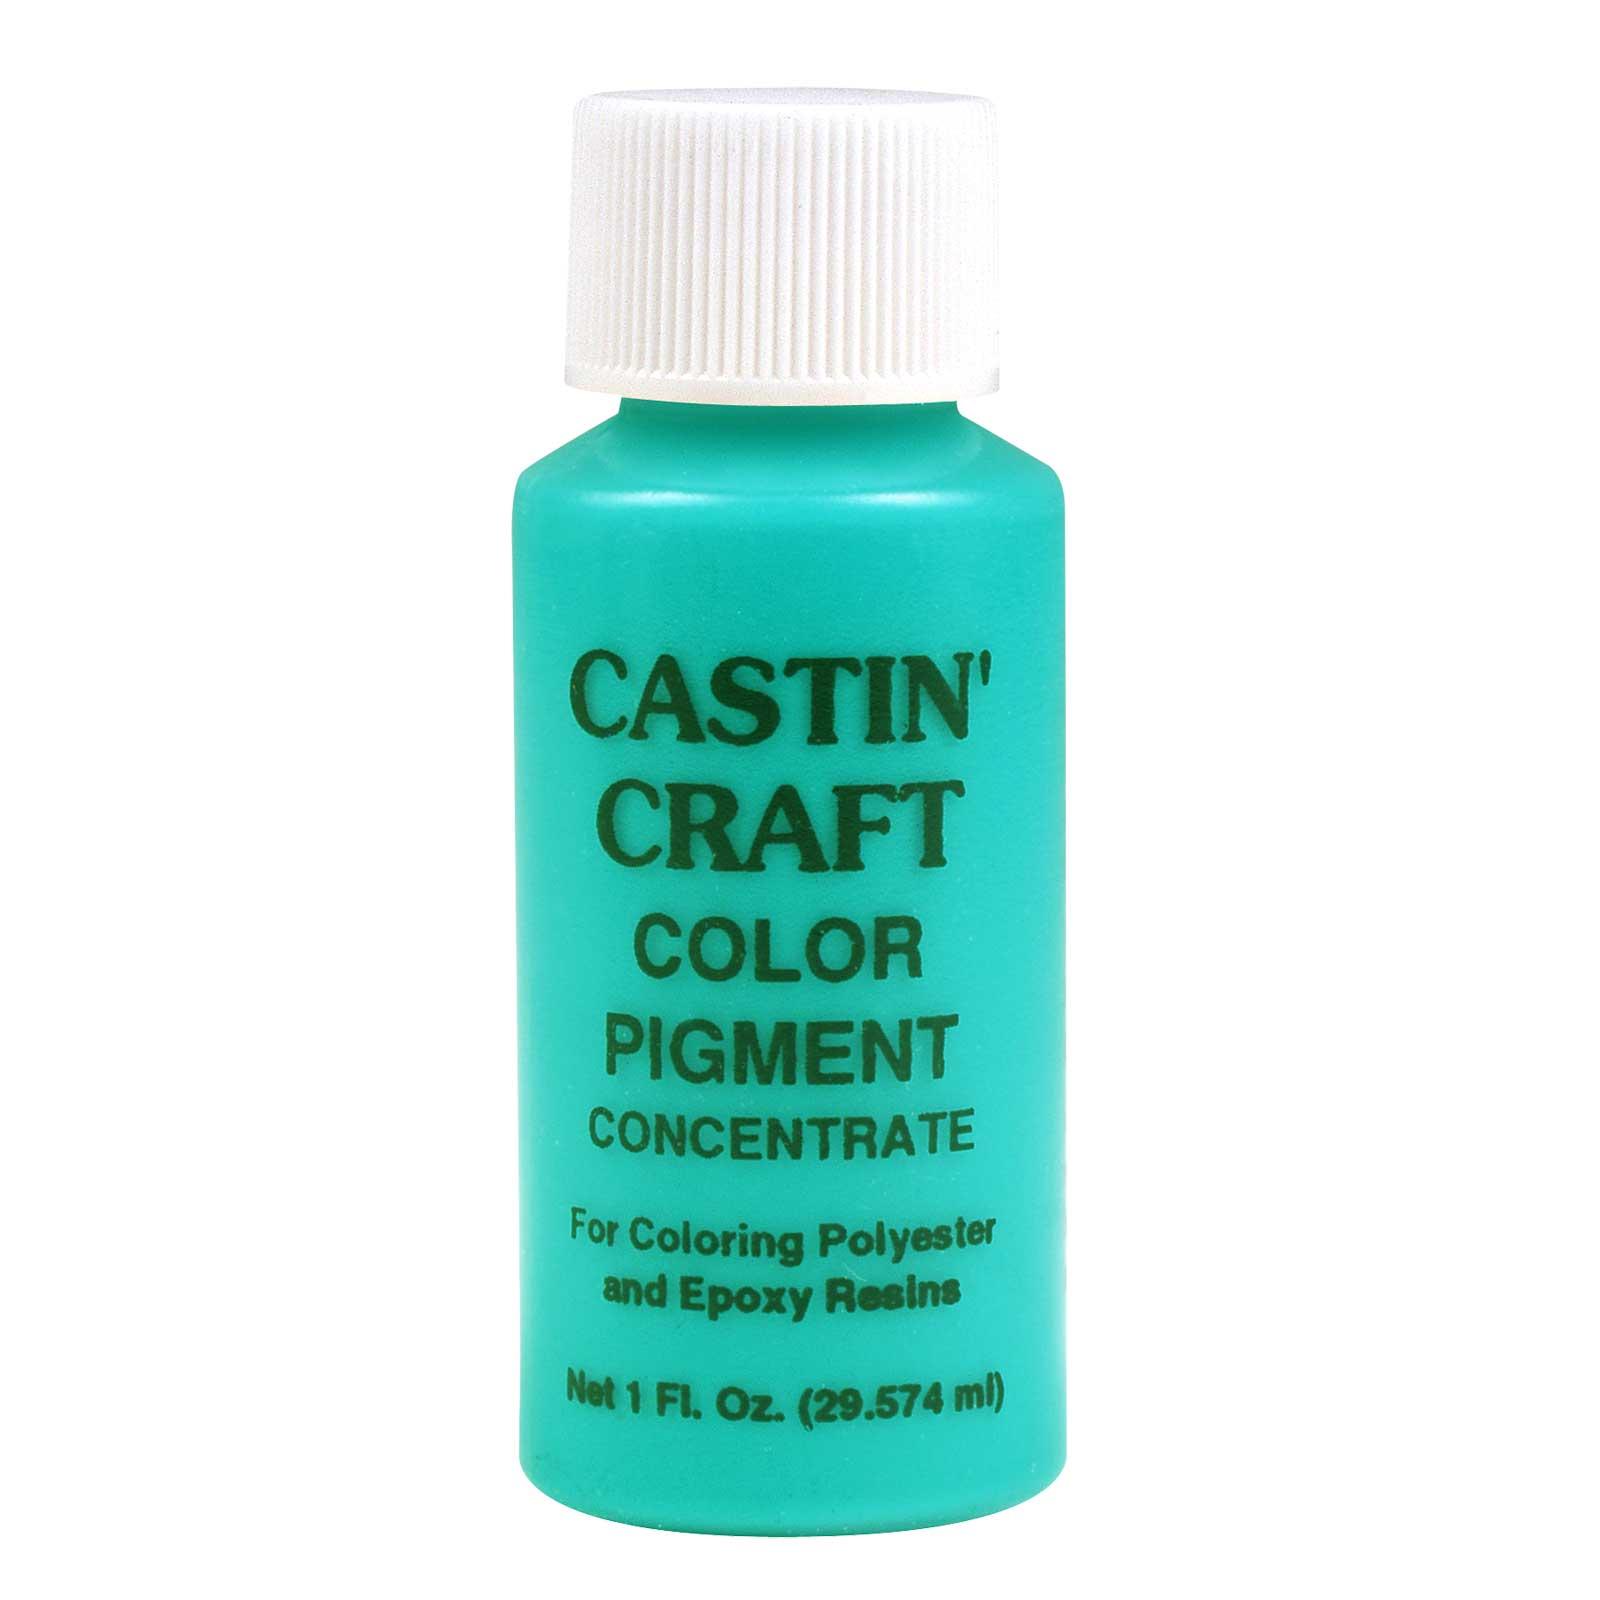 Castin craft color pigment - Castin Craft Color Pigment 19